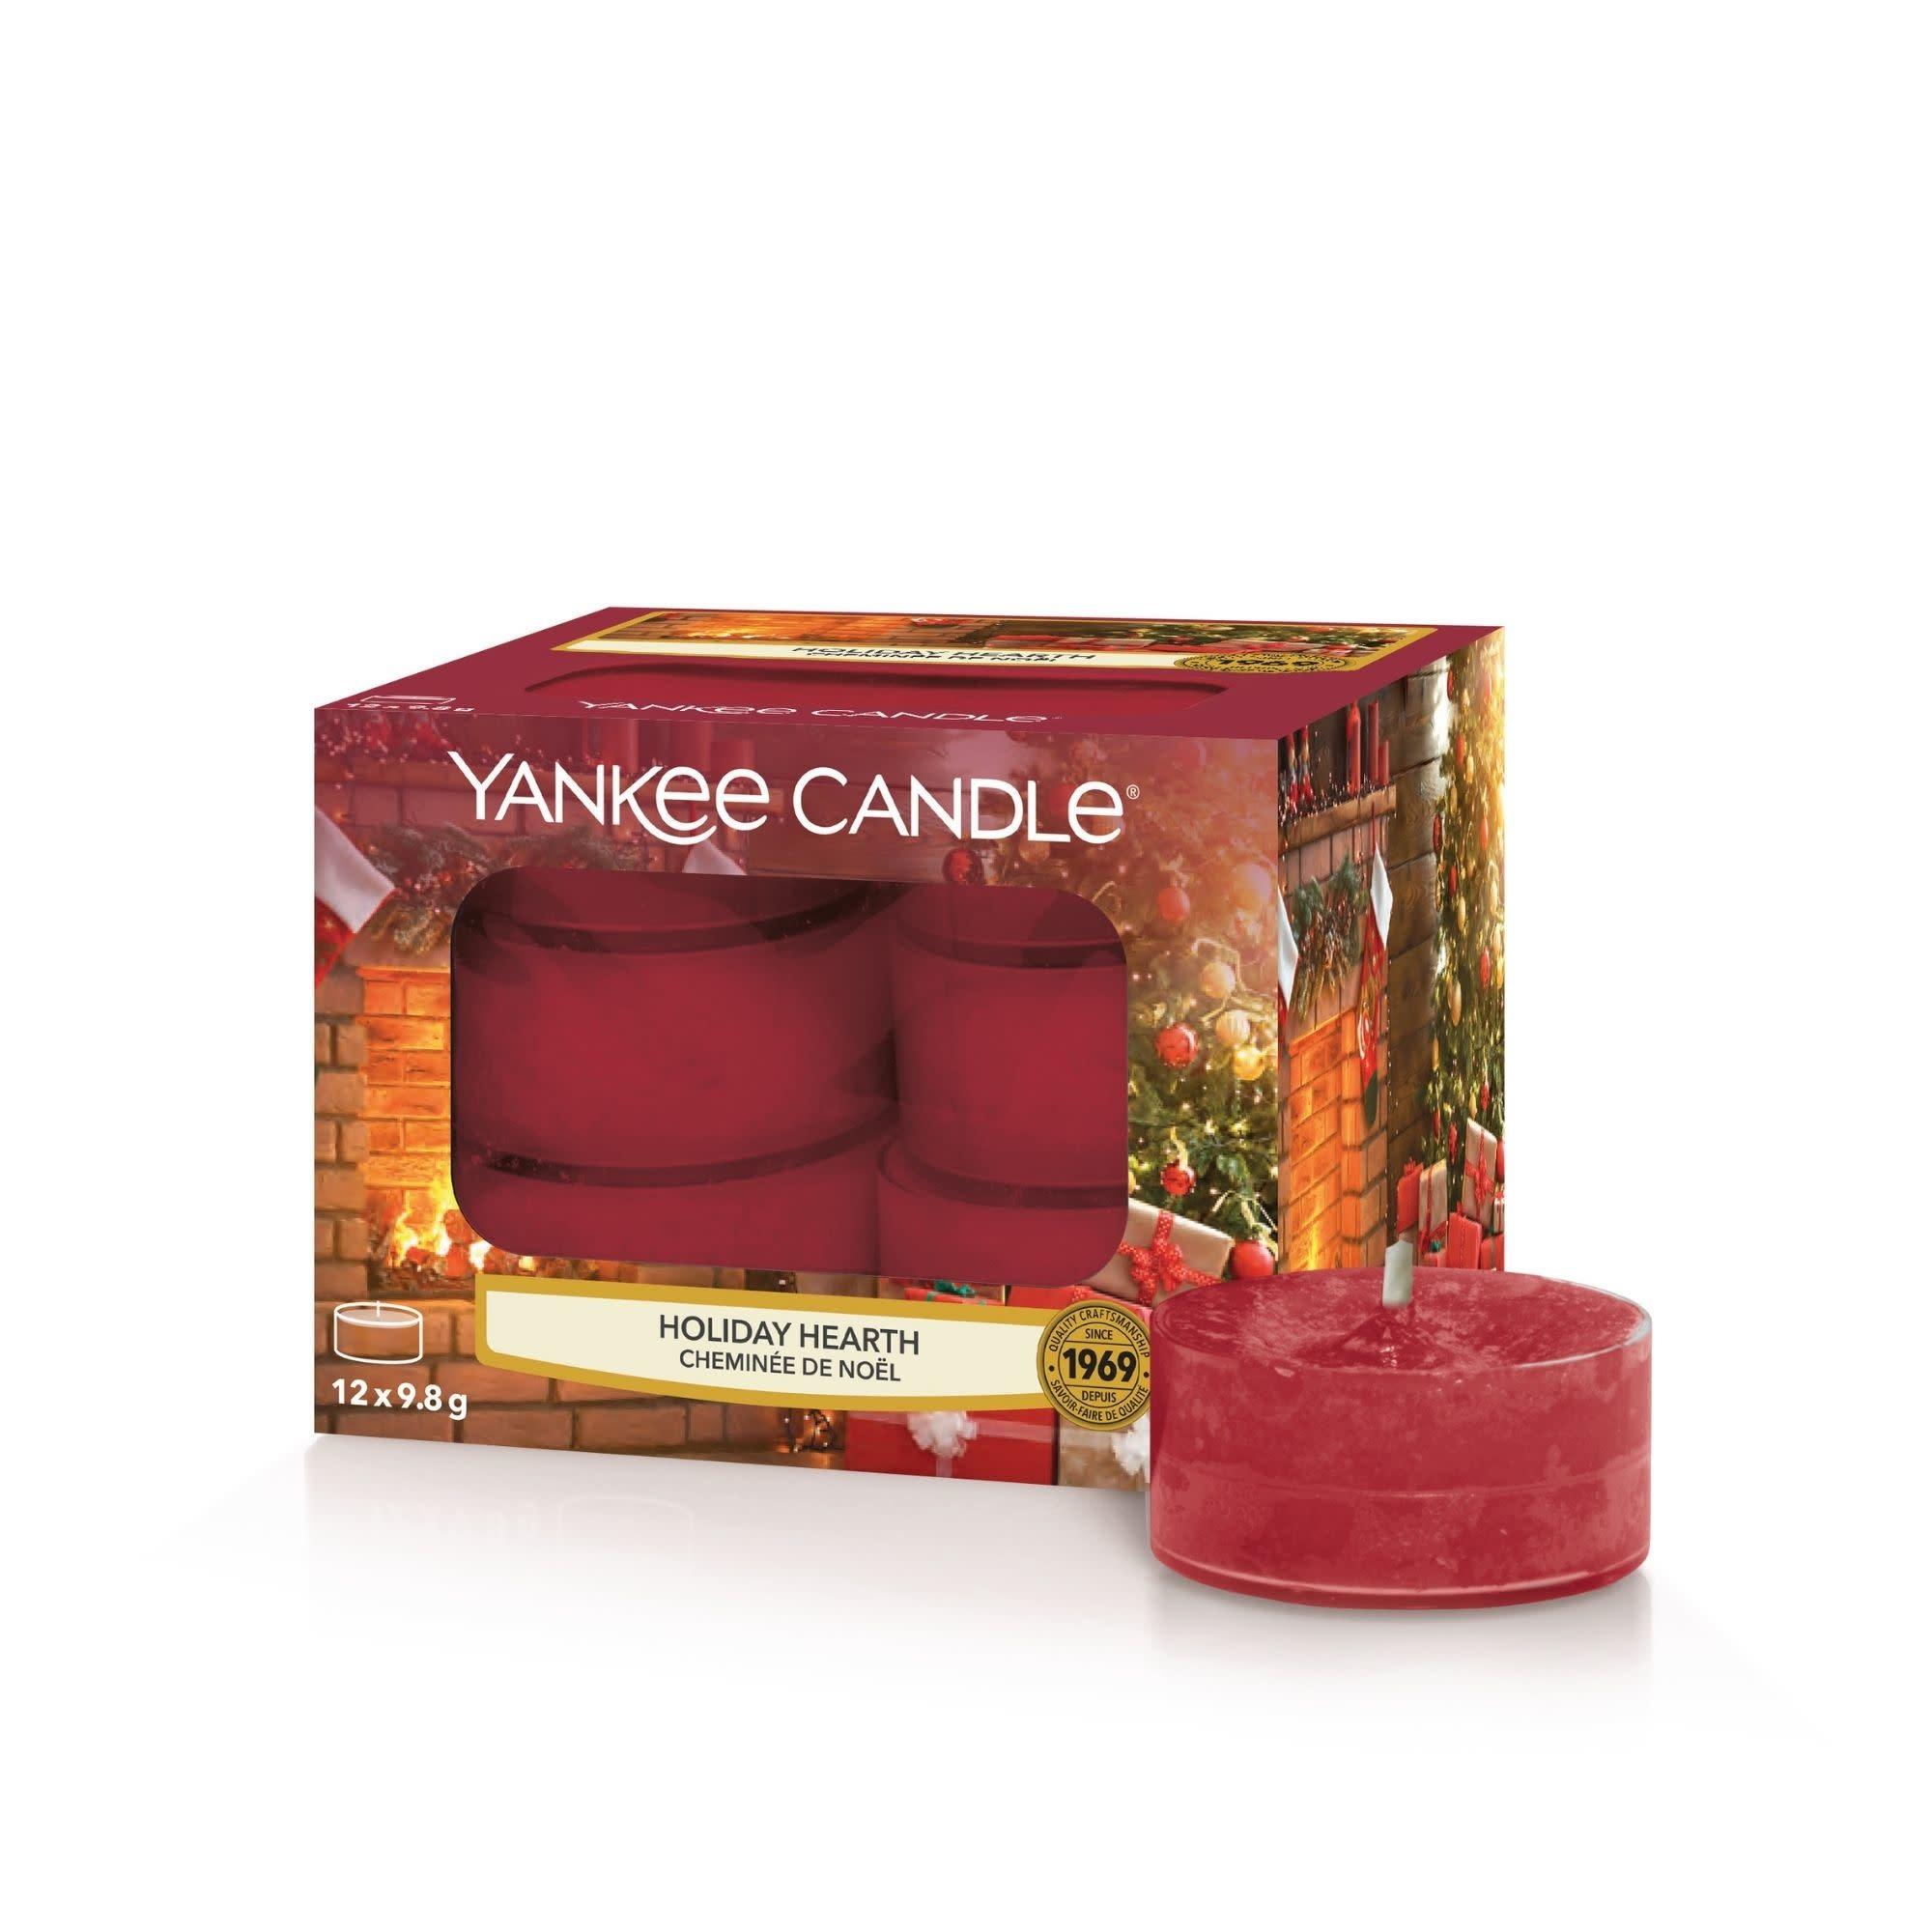 Yankee Candle Holiday Hearth - Tea Lights